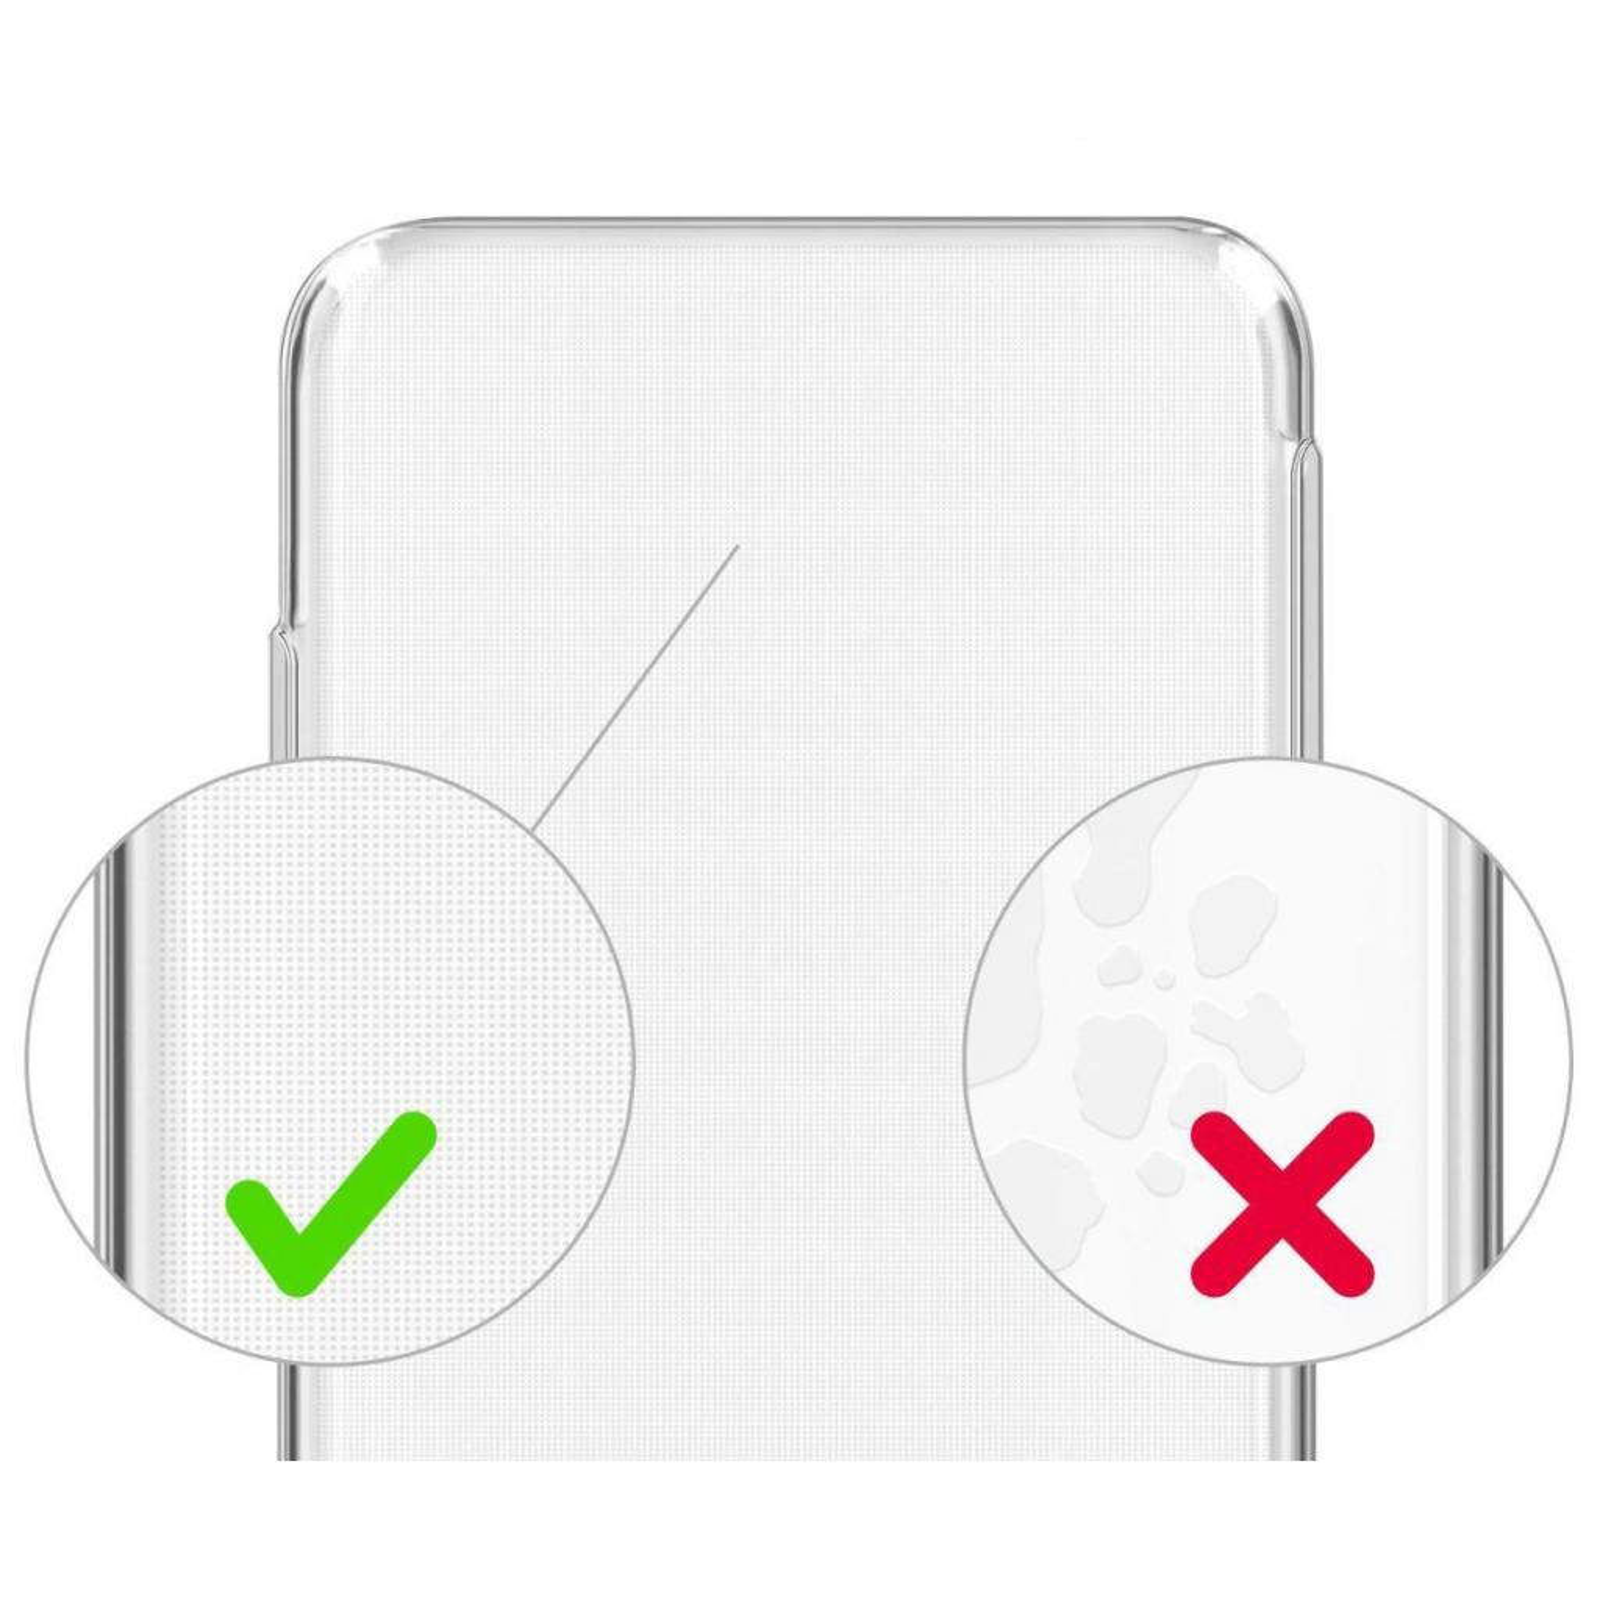 Чехол для моб. телефона Laudtec для iPhone 7/8 Plus Clear tpu (Transperent) (LC-IP78PST) изображение 10